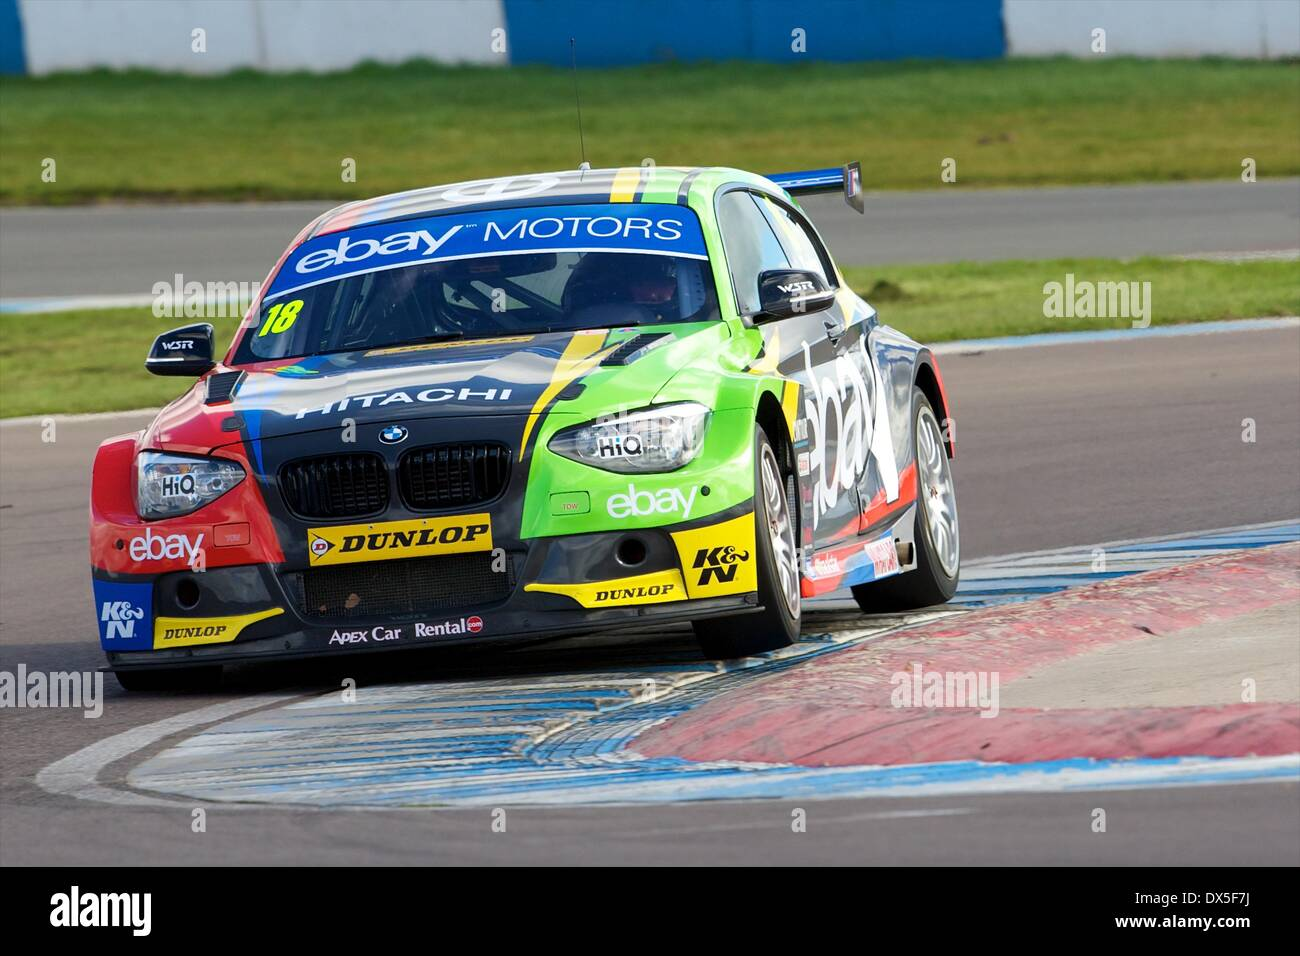 Donington, UK. 18th Mar, 2014. Nick Foster driving his eBay Motors ...